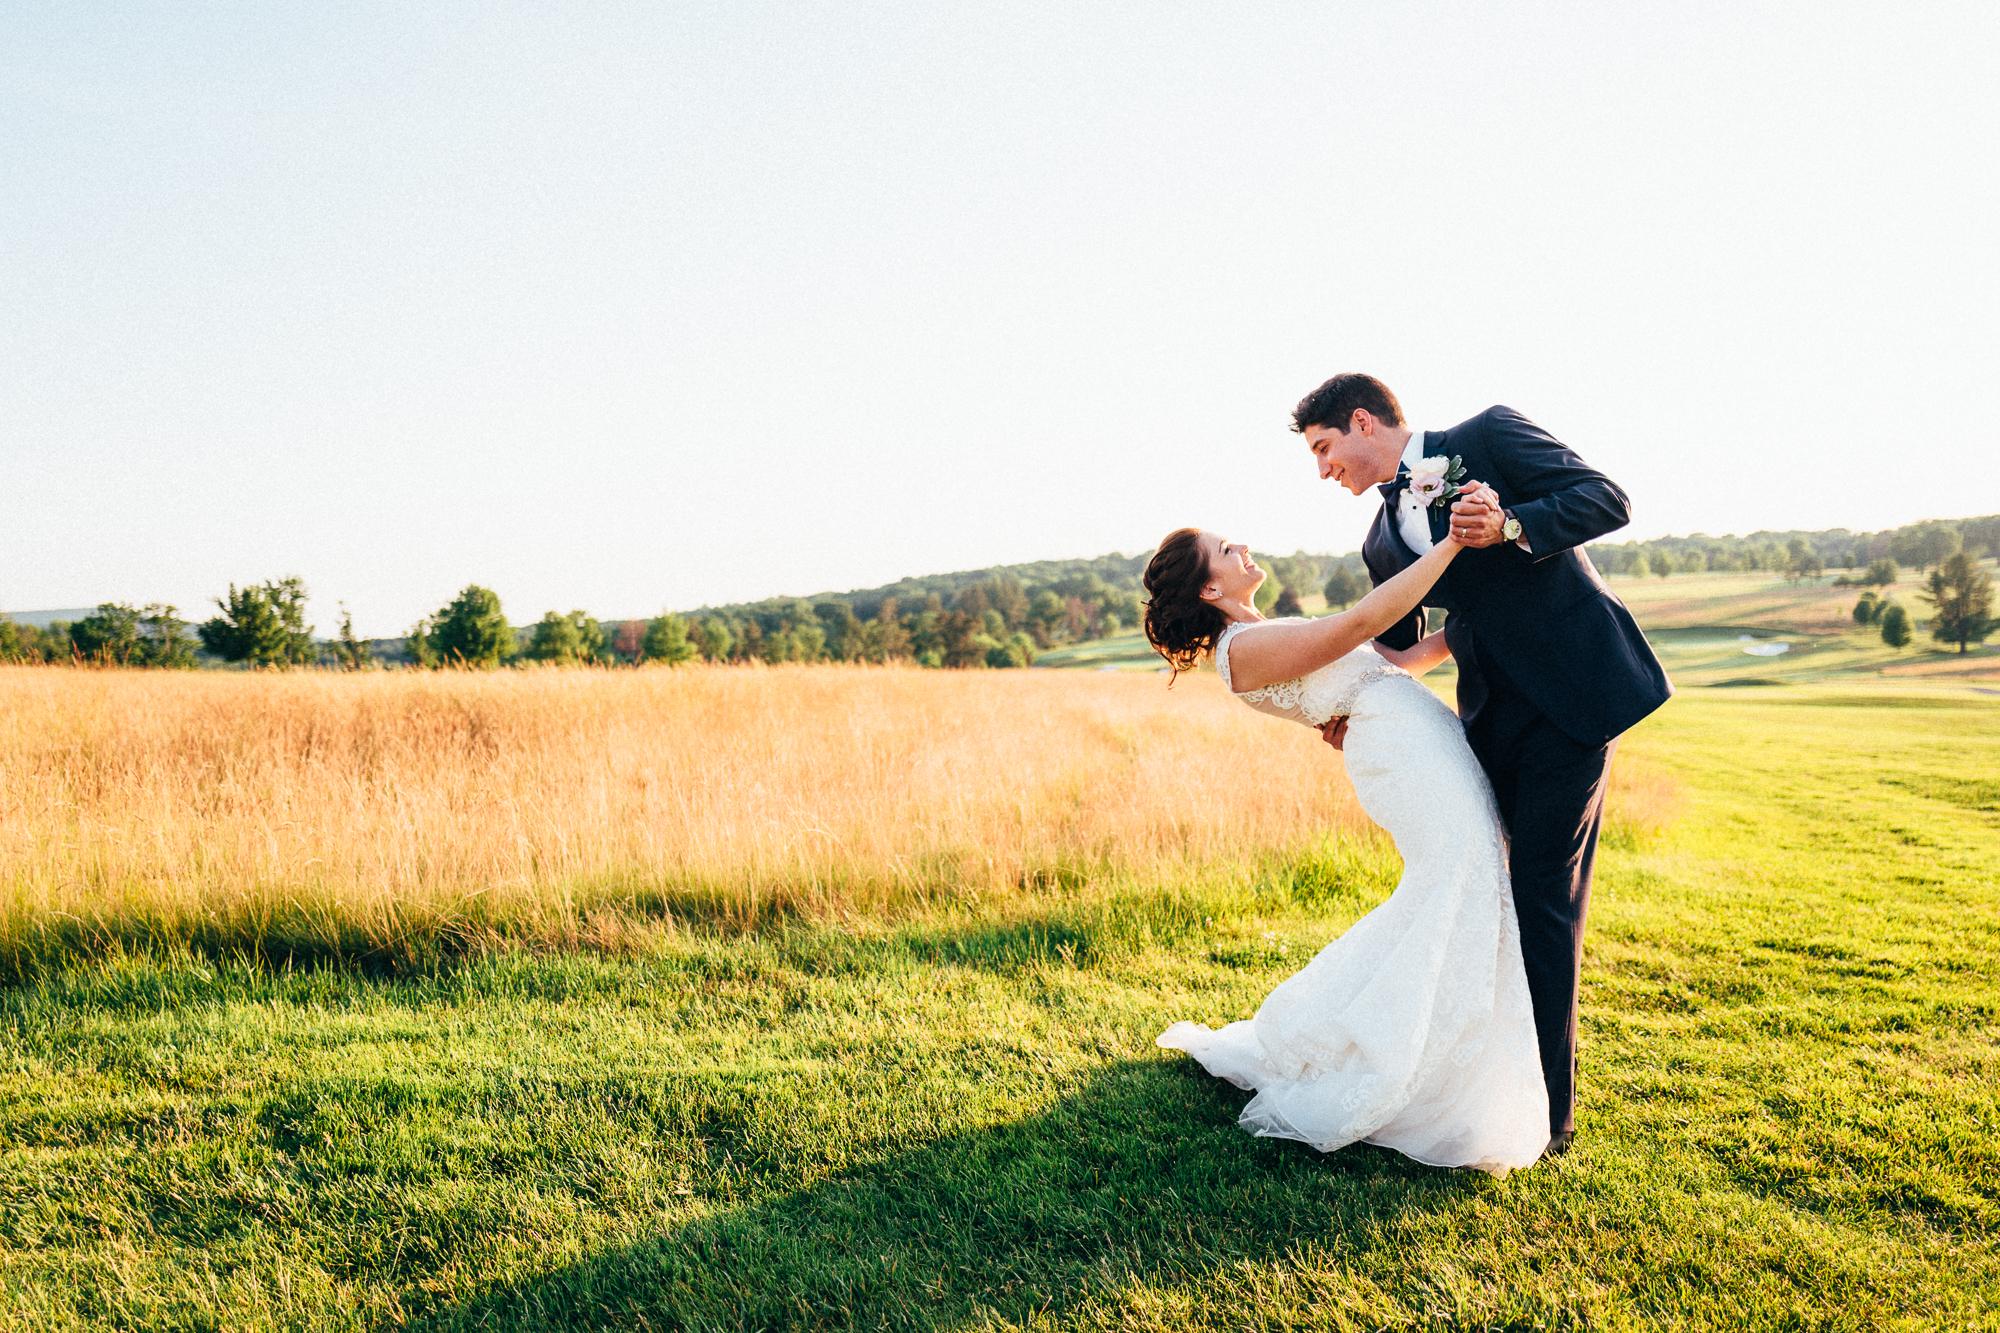 scranton-wedding-photography-zak-zavada-2016.06-rebeccaIan-0883.jpg